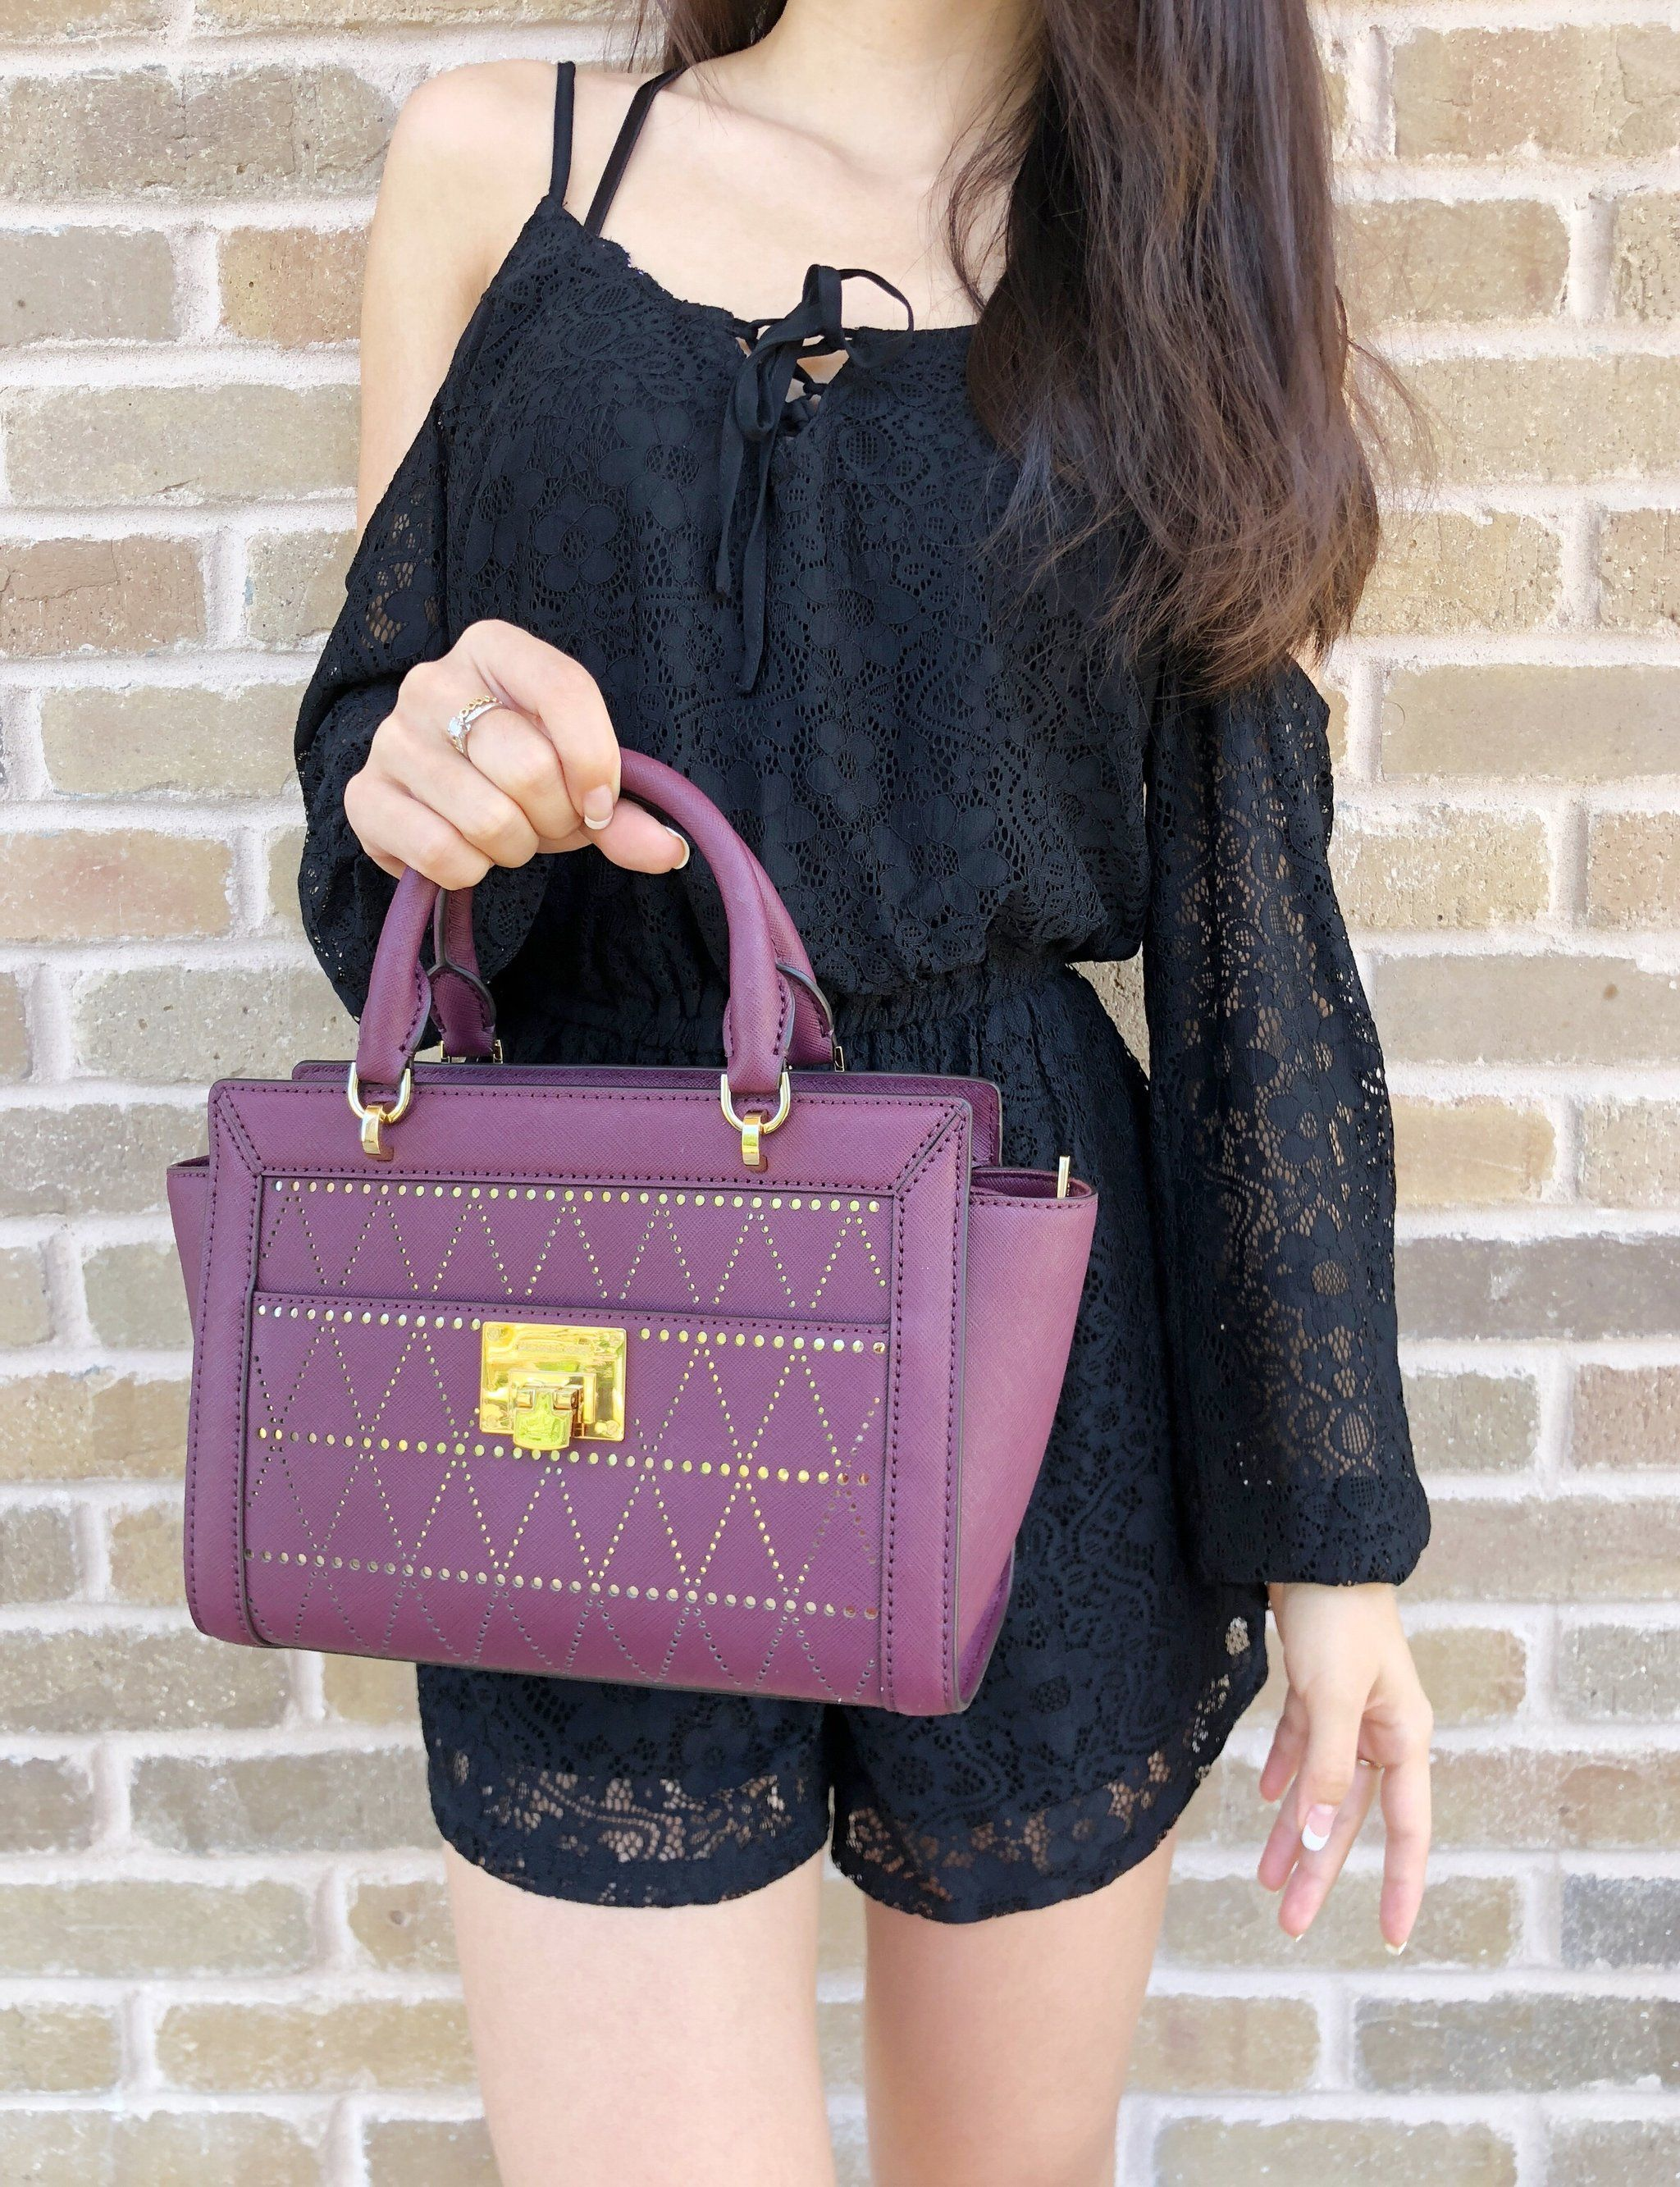 e9b485cd3f438e NWT Michael Kors Tina Small Top Zip Satchel Handbag Crossbody Plum ...